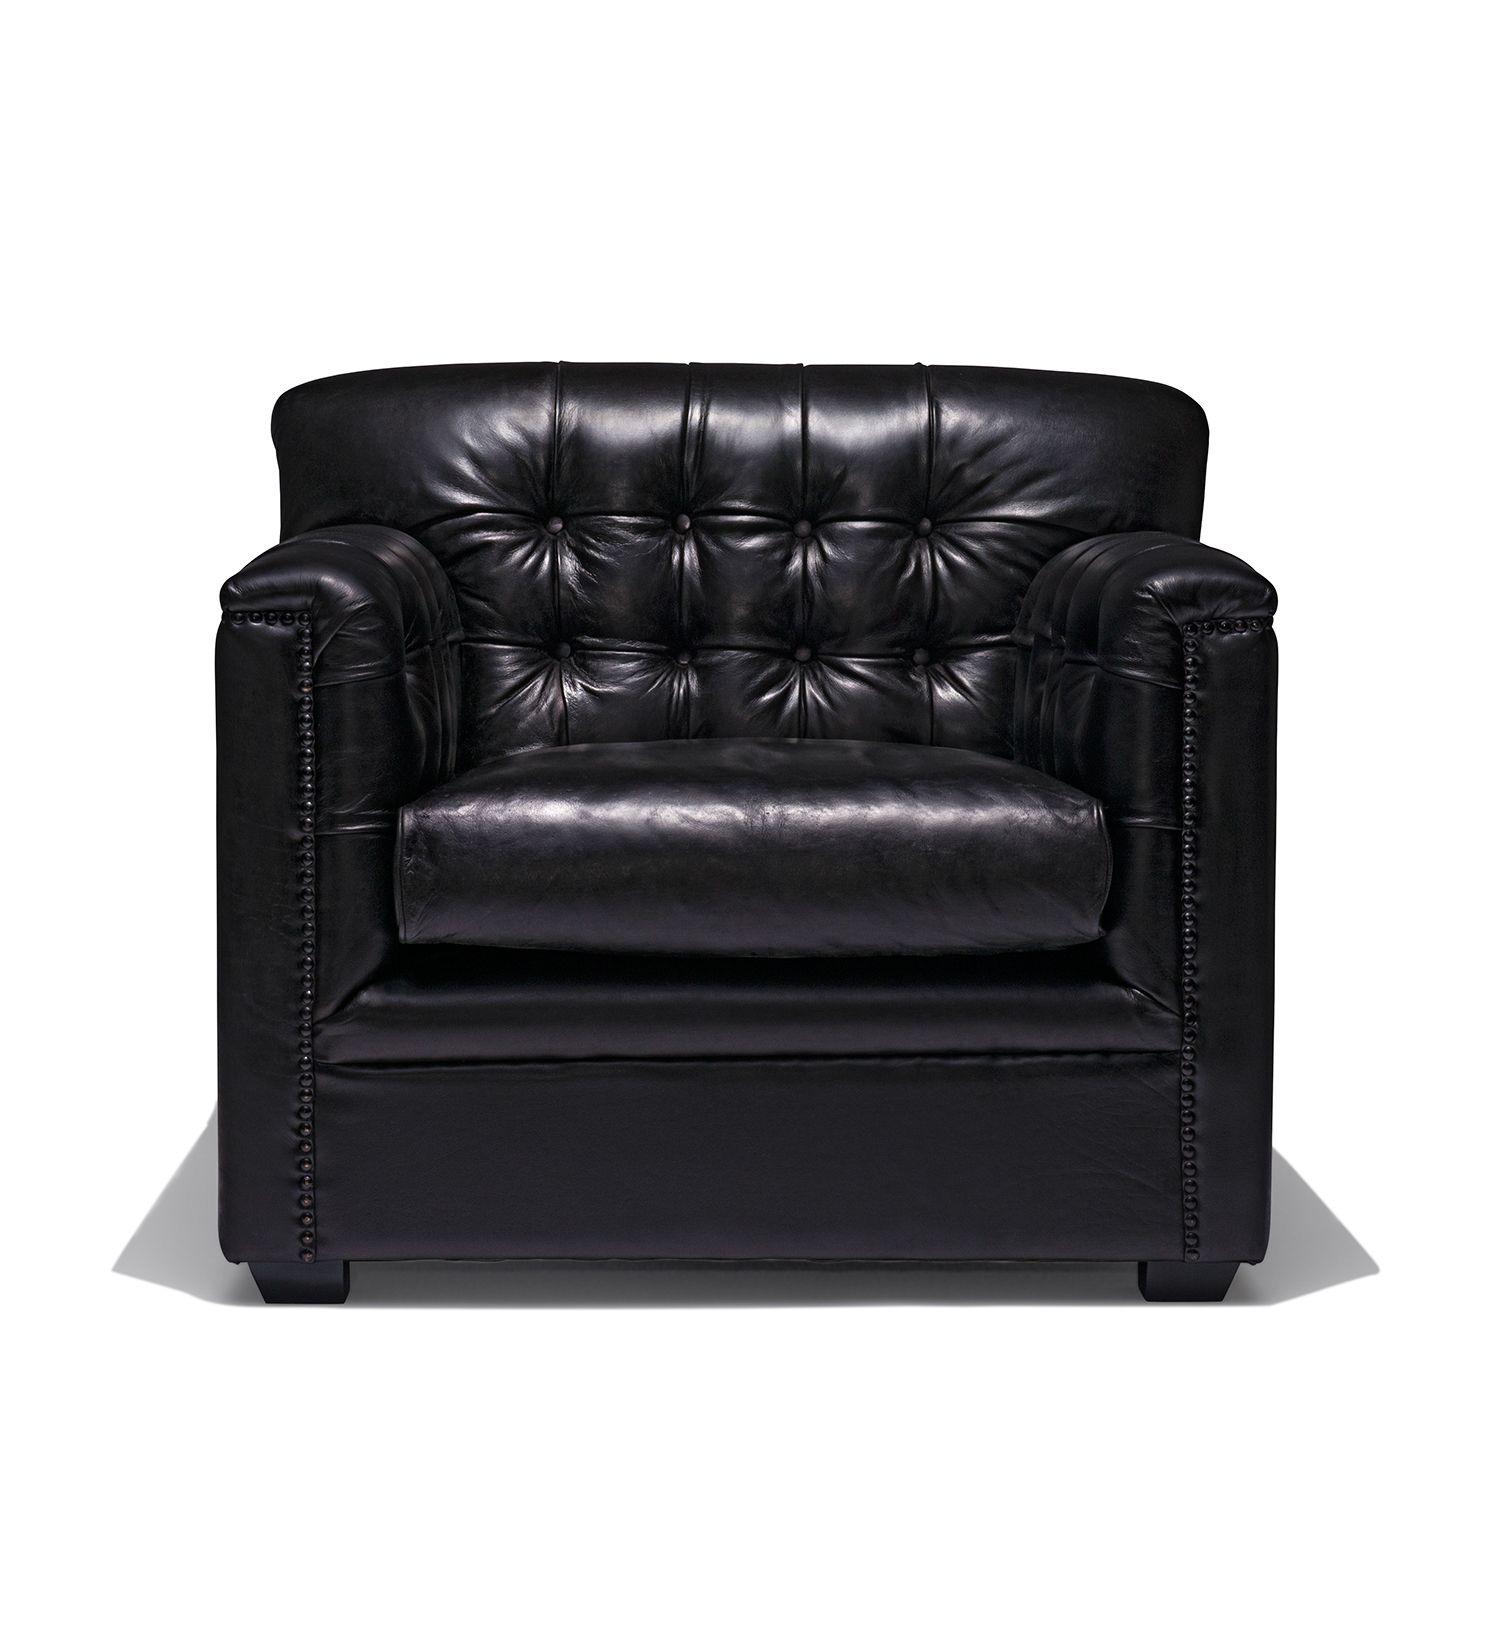 Wayfair Leder Stuhl Kunststoff Stühle Leder Club Sessel Mit Ottomane